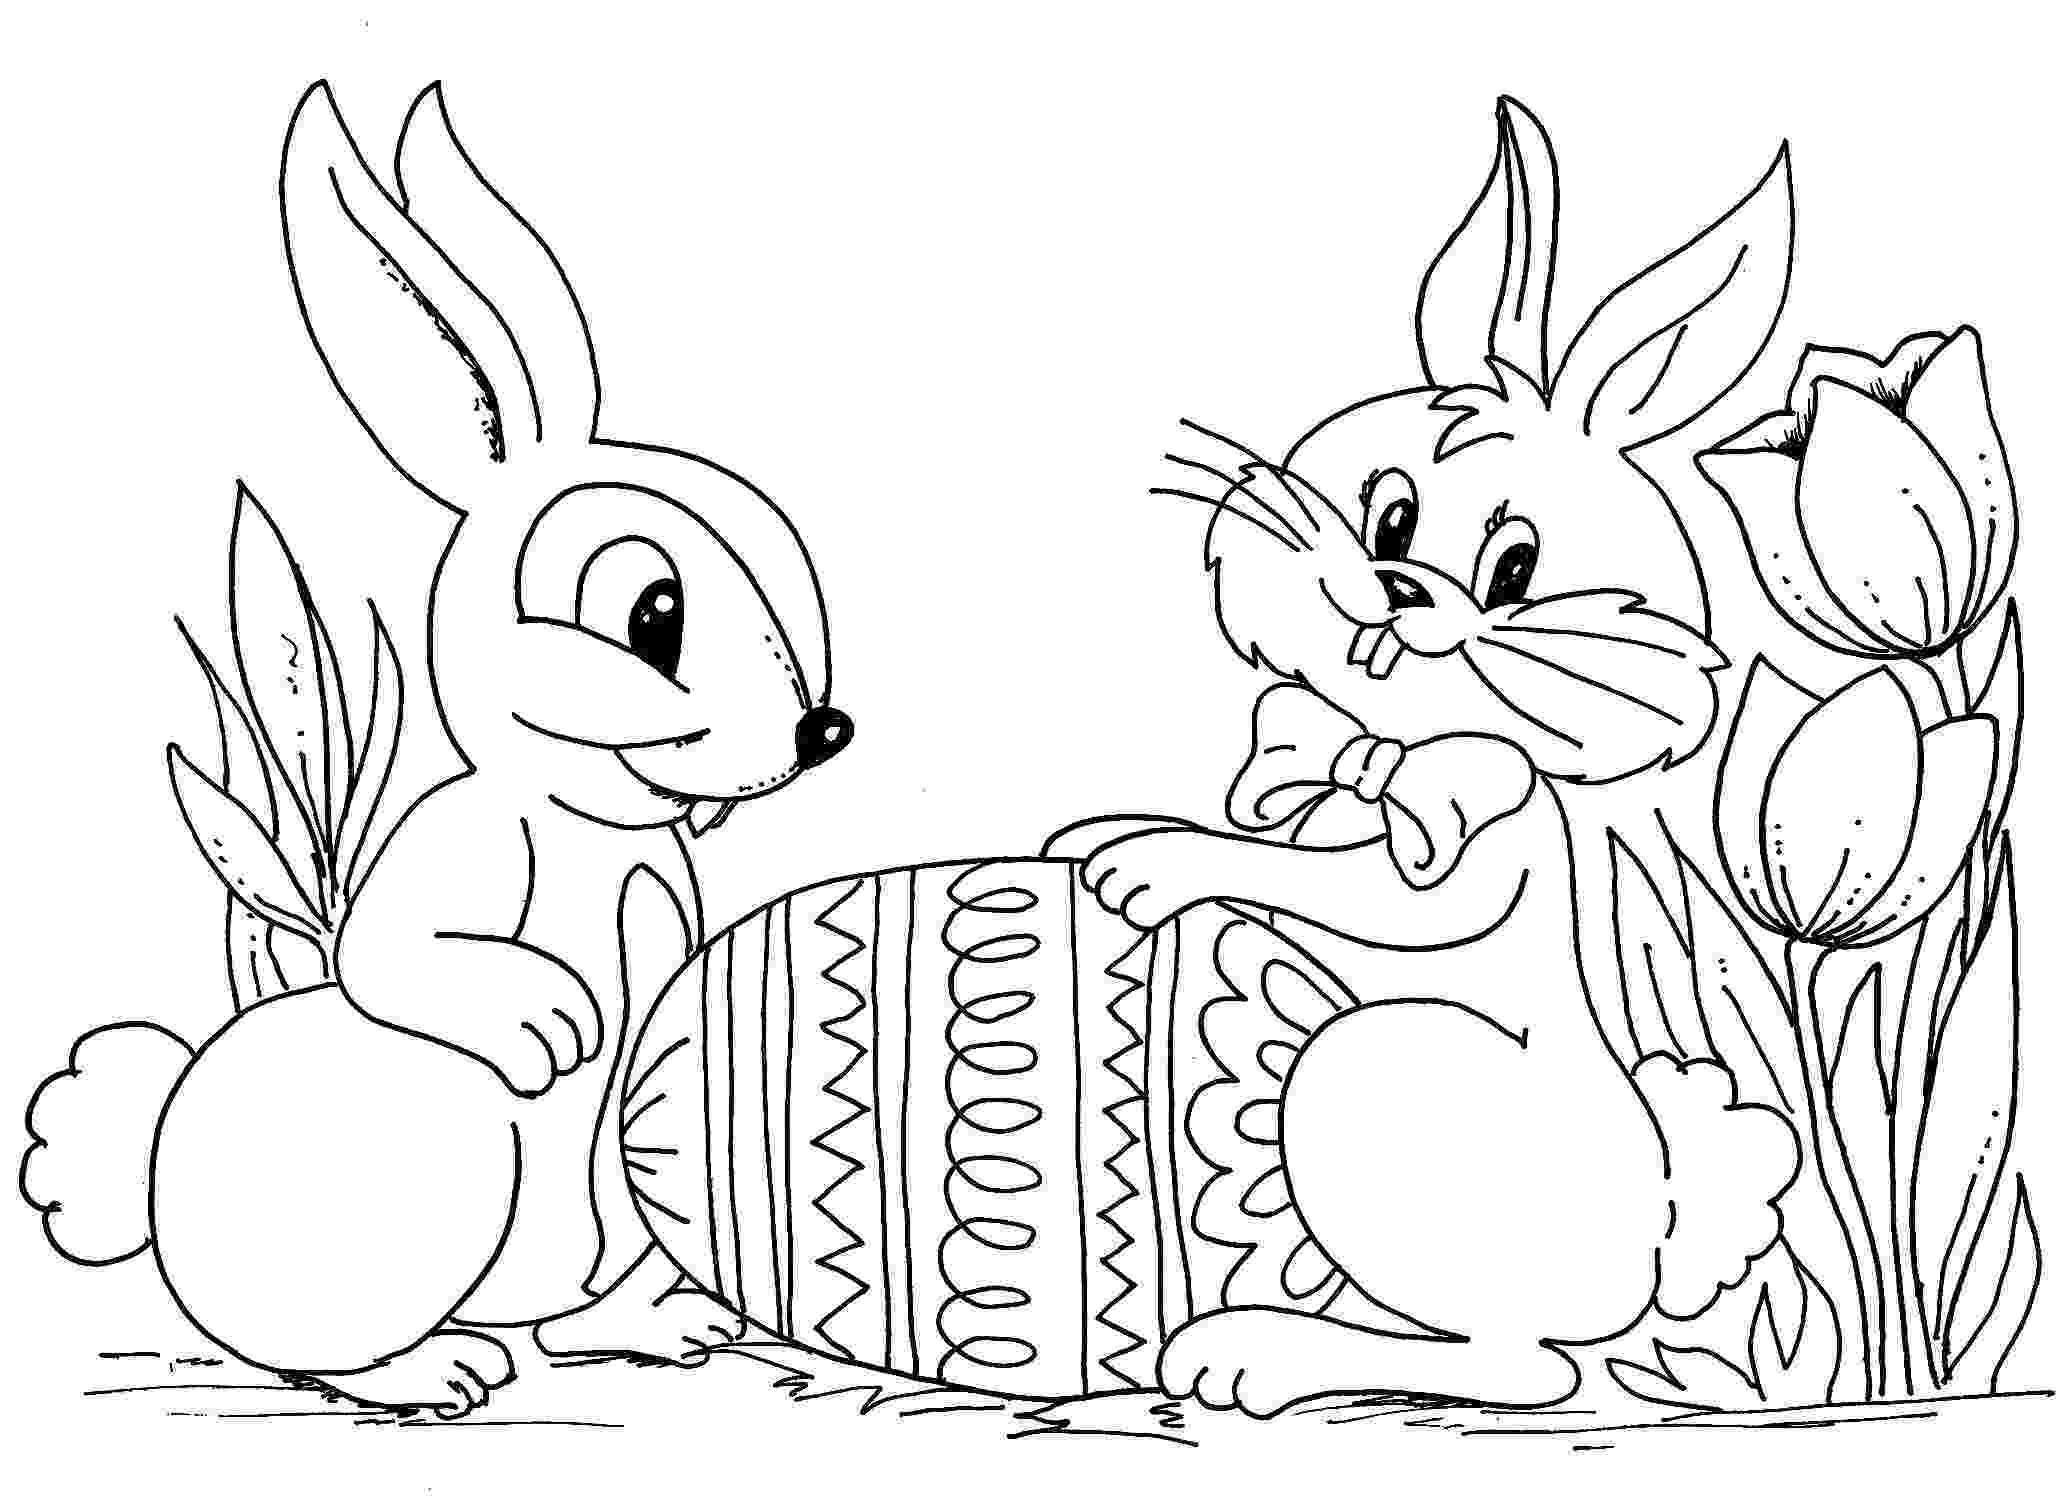 colouring easter bunny girl easter bunny coloring pages hd background 9 hd bunny colouring easter